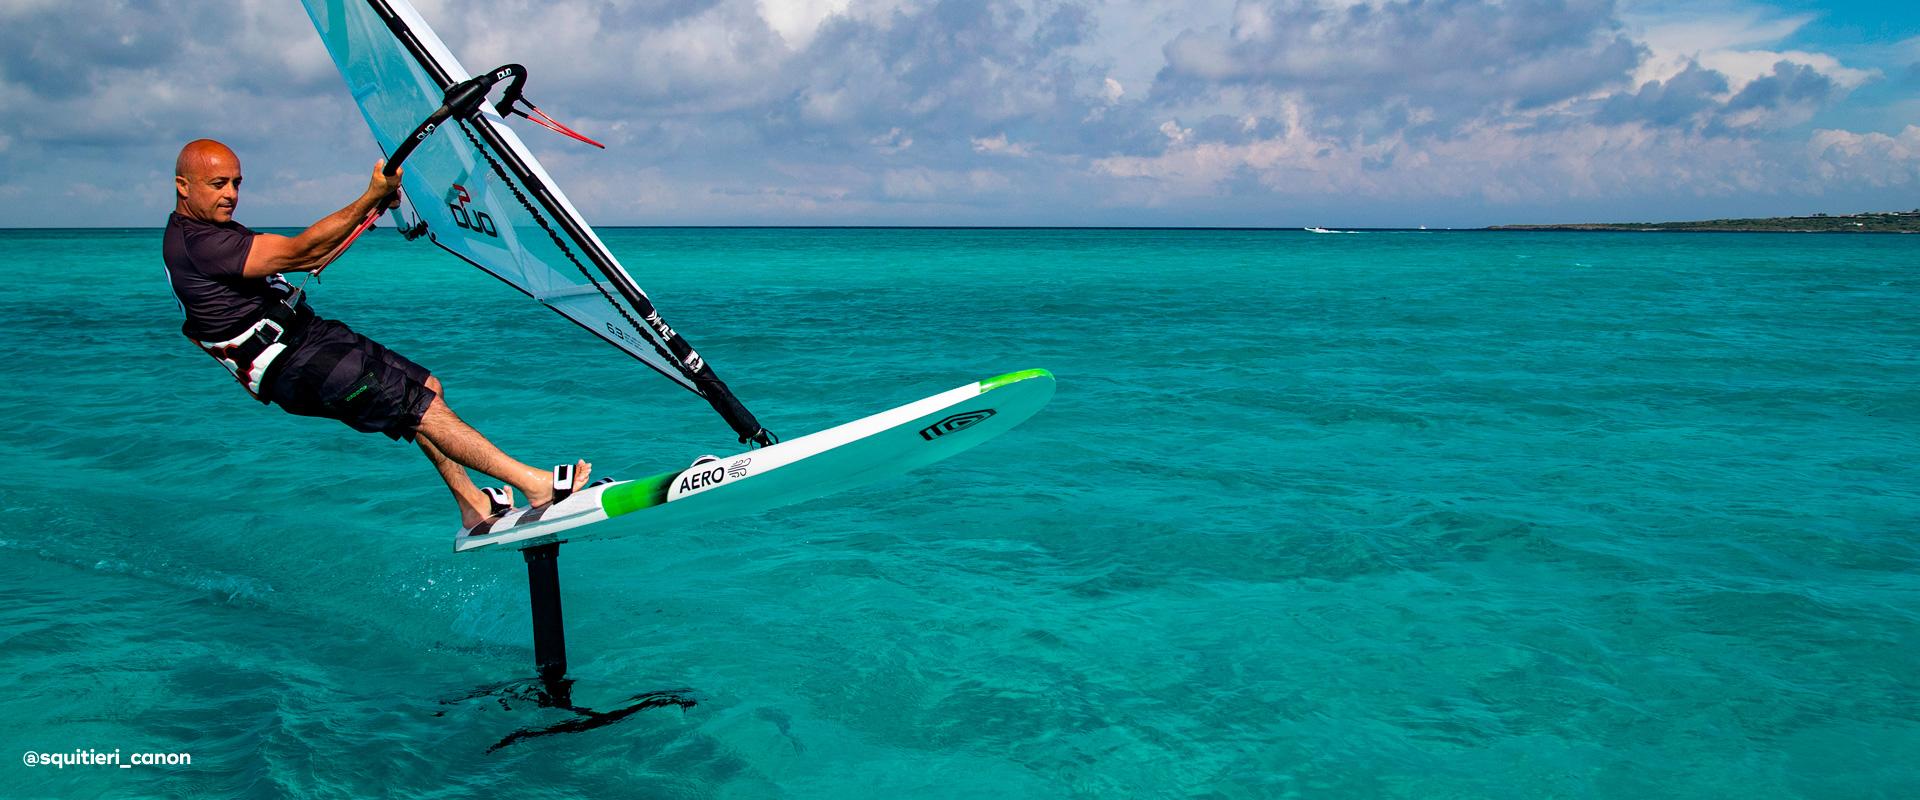 I 99 Aero Foil Freeride Board I 99 Windsurfing